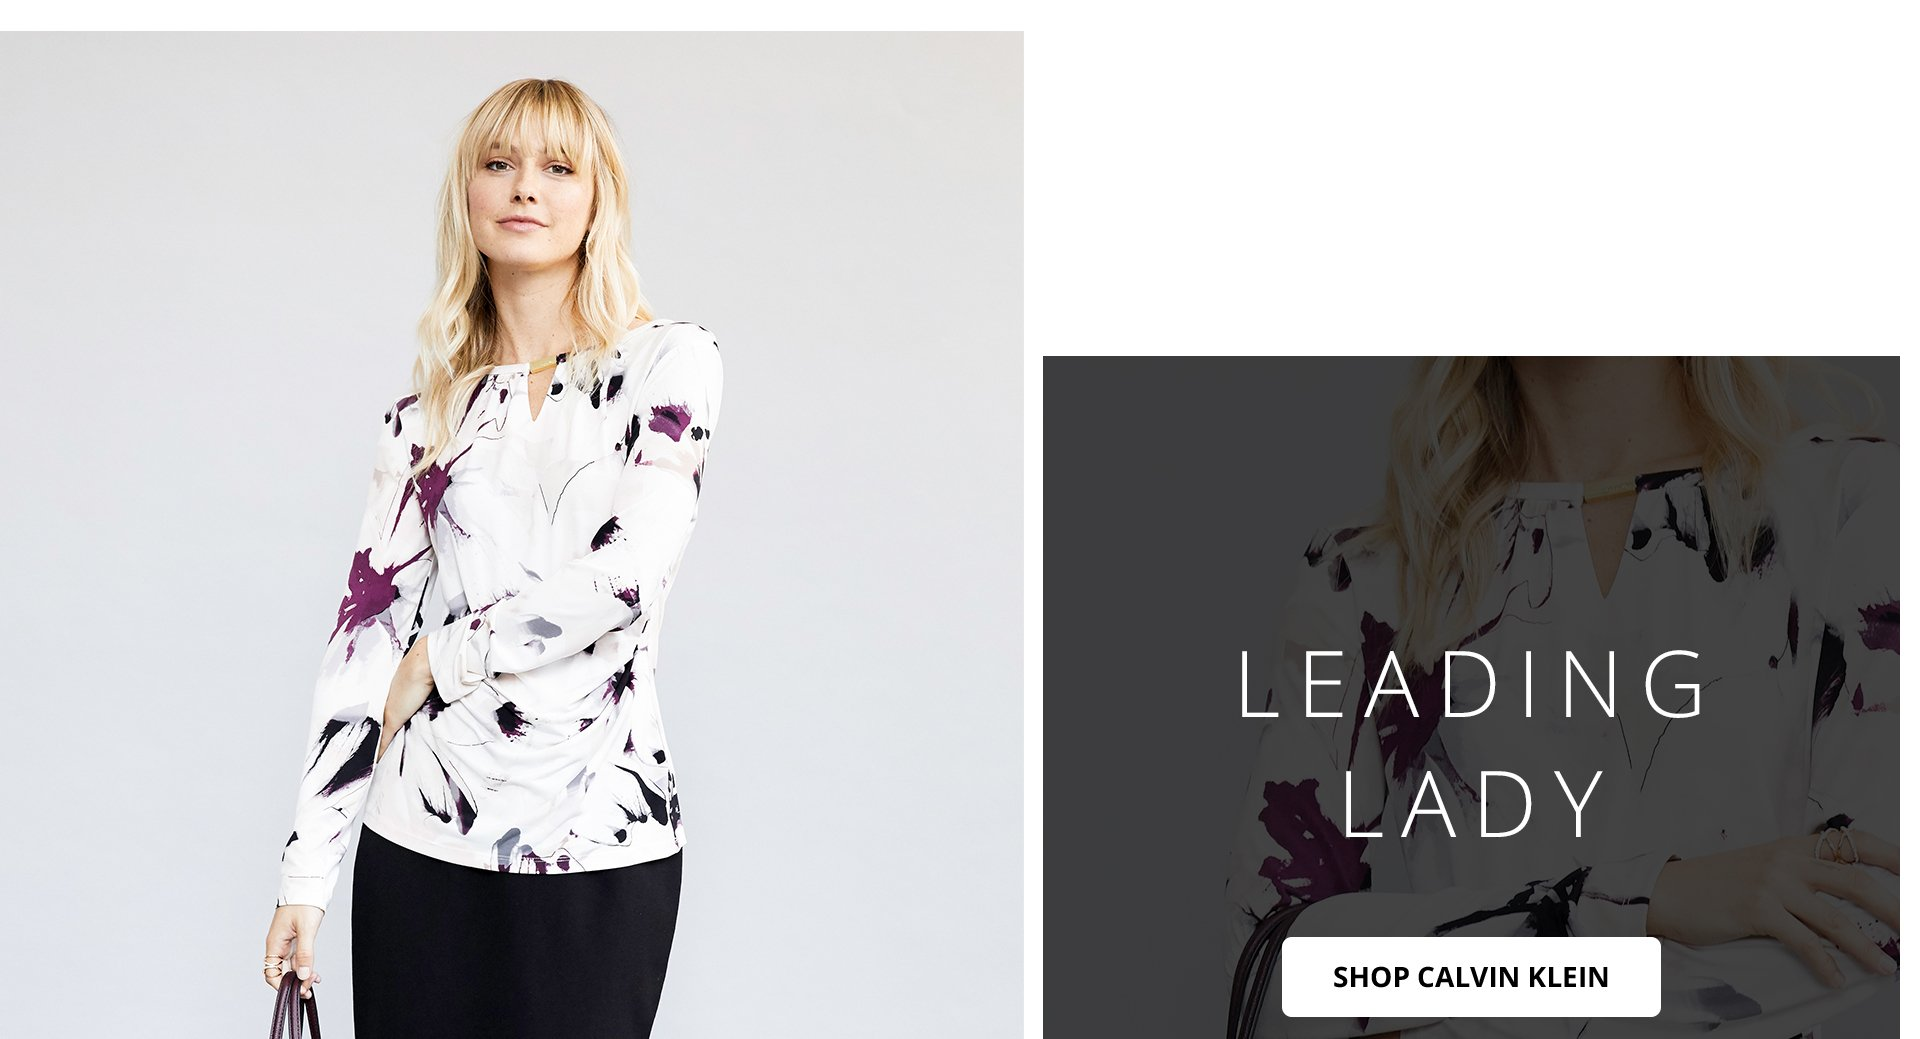 Leading lady. Shop Calvin Klein.